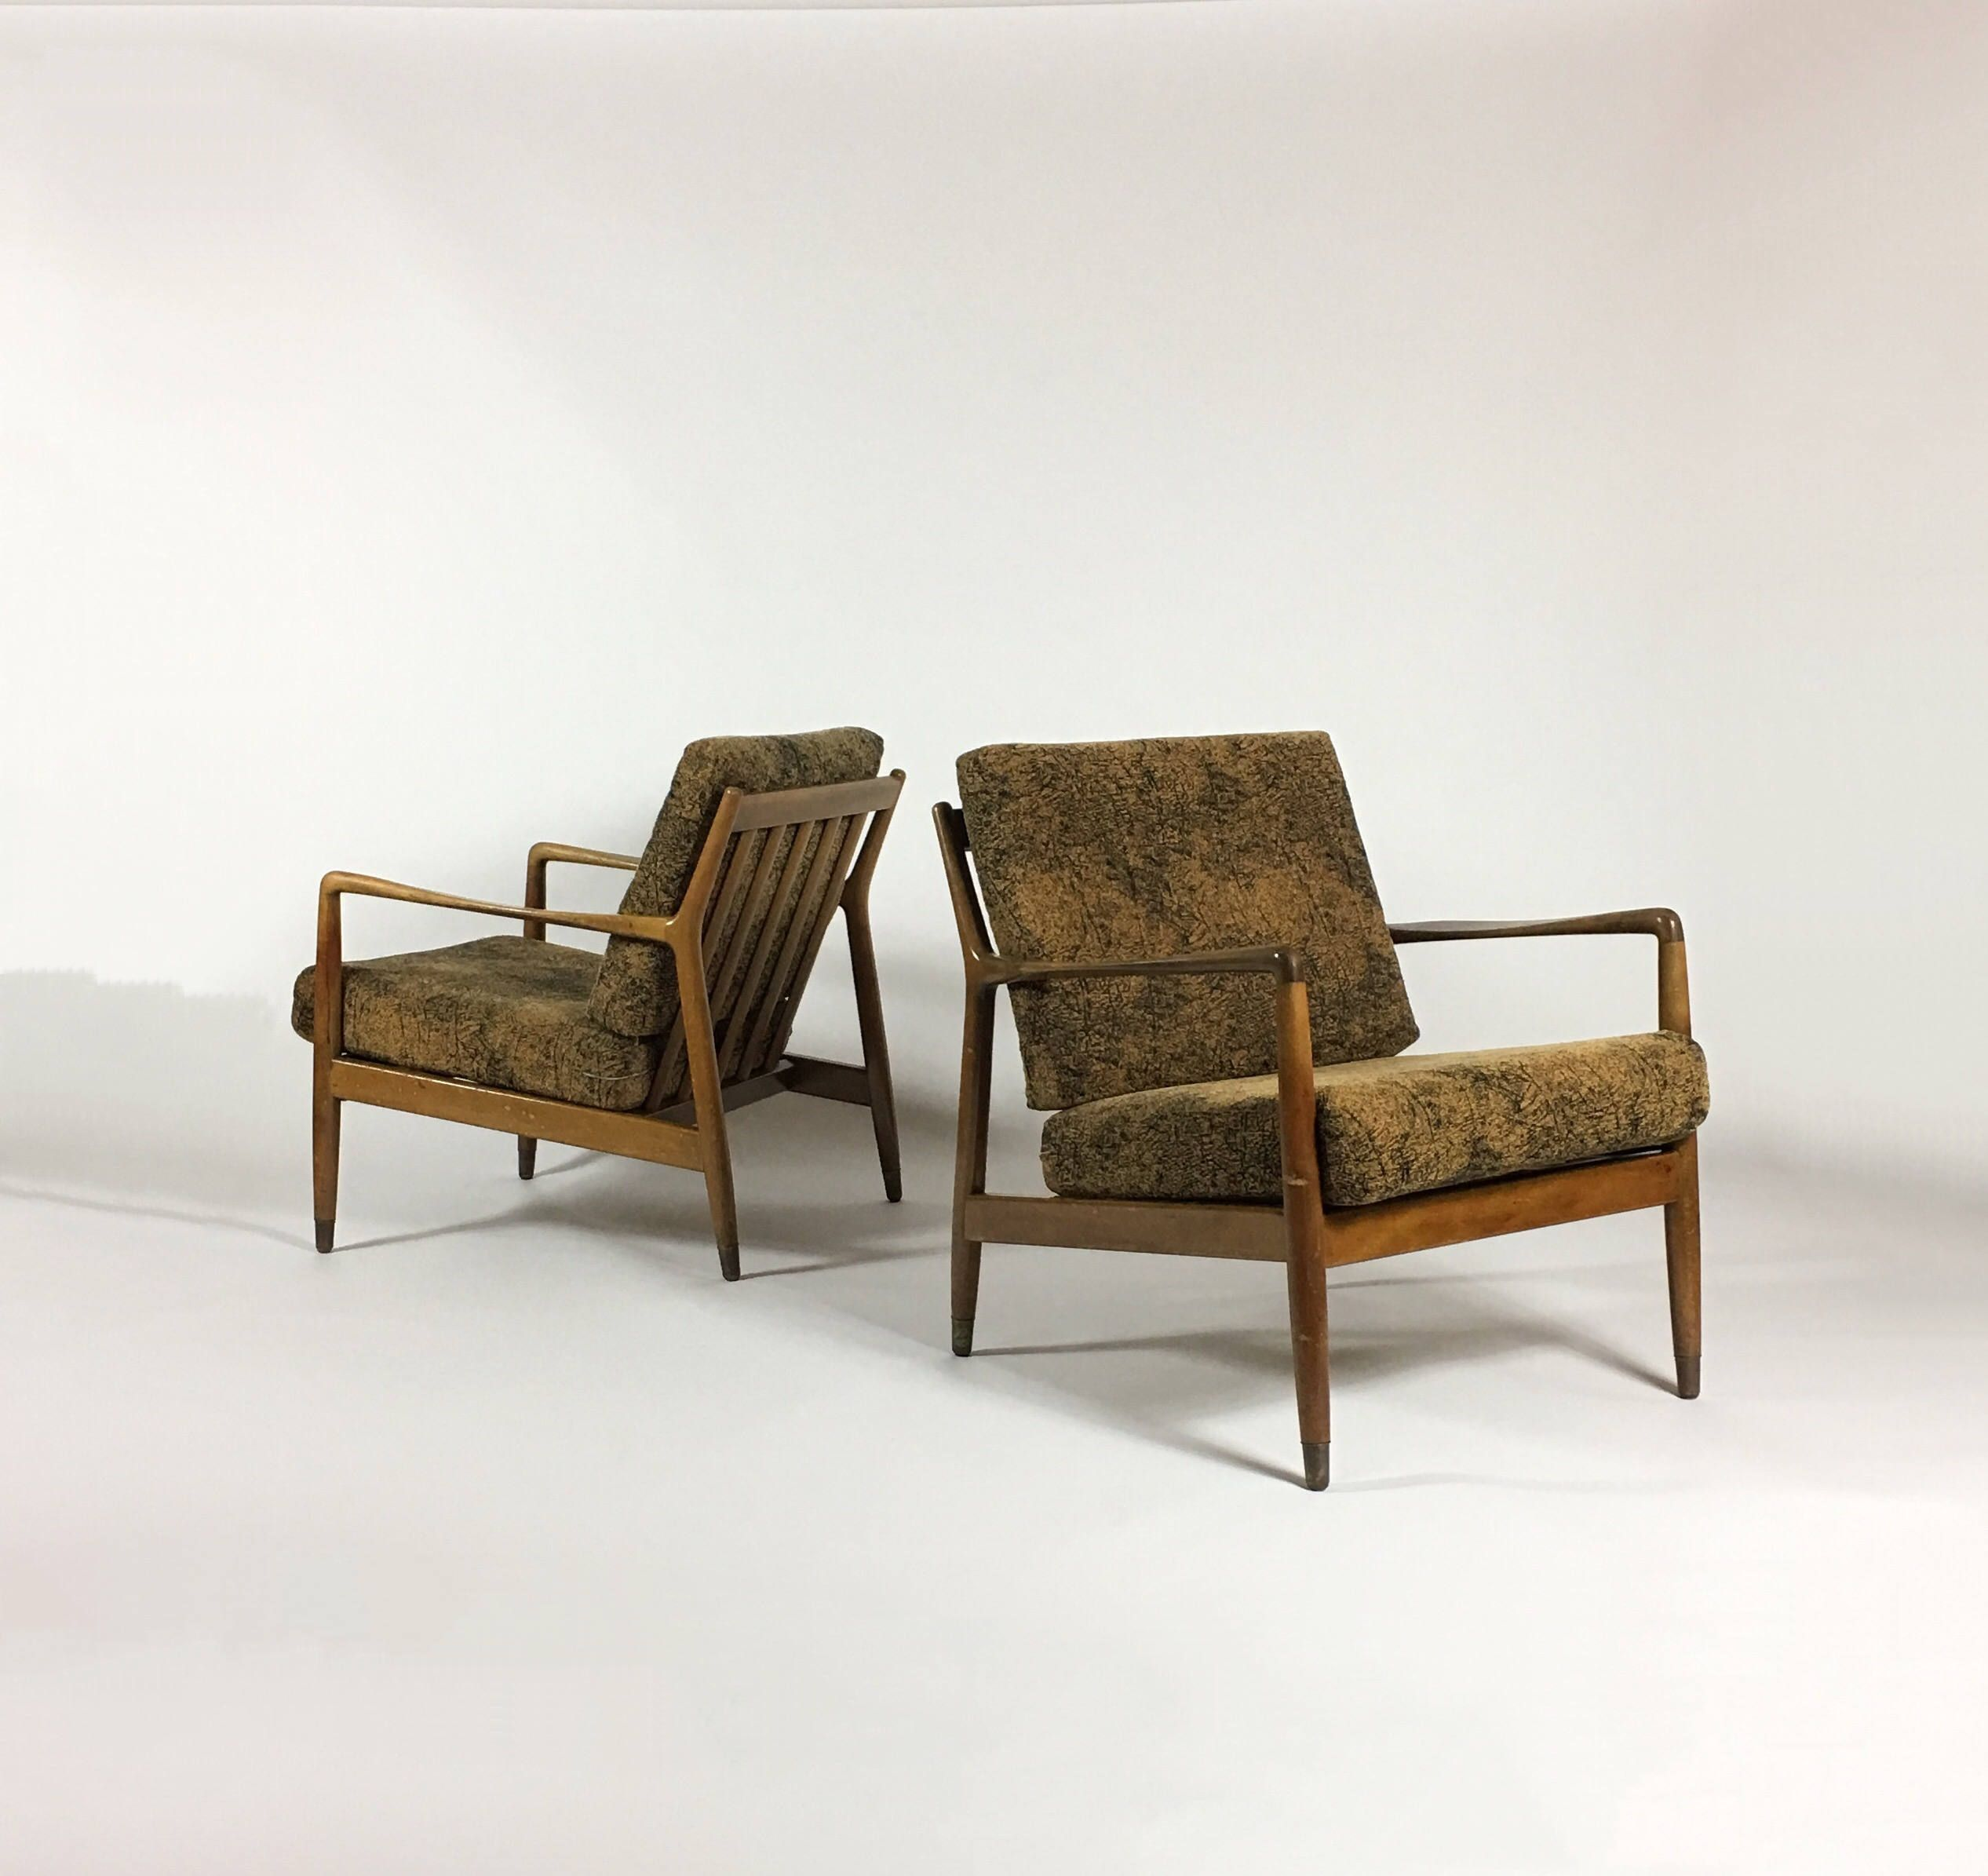 Pair Folke Ohlsson DUX Modern Lounge Chairs, Mid Century Modern Chair,  Scandinavian Furniture,